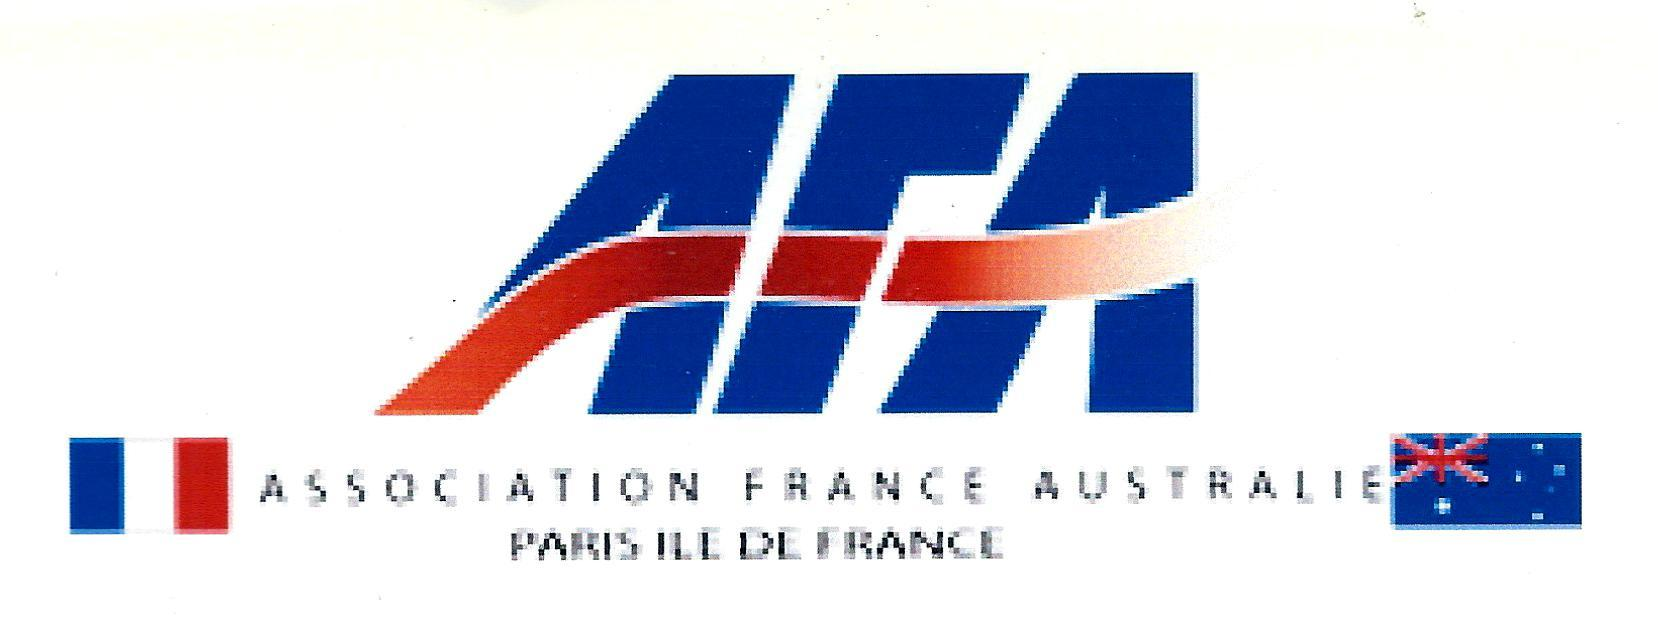 Association France Australie